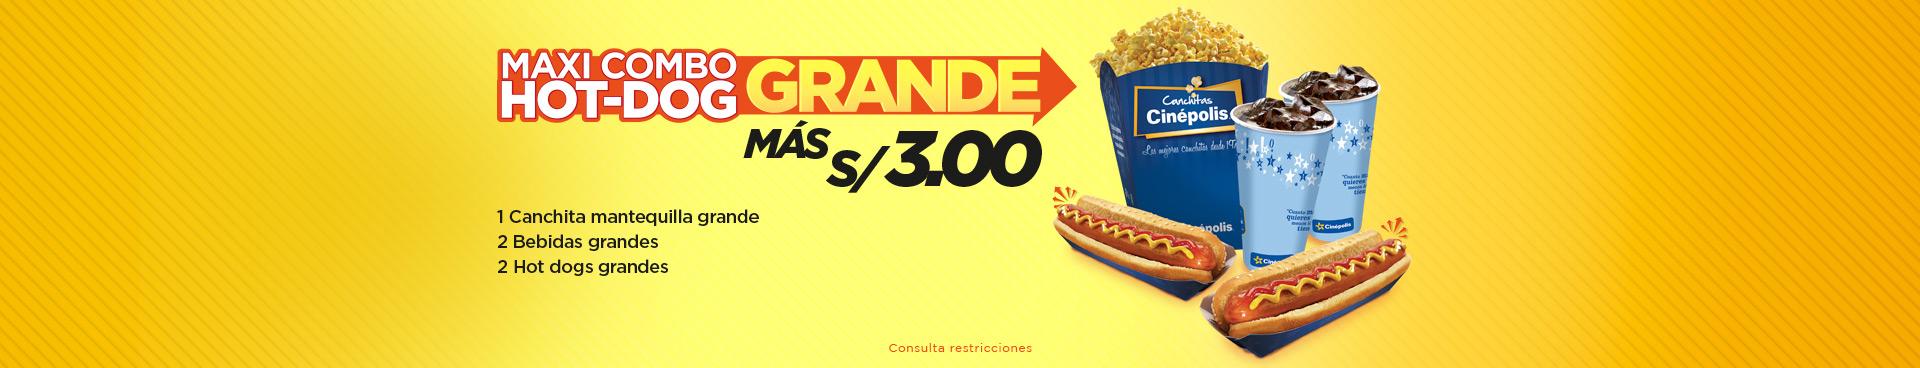 Maxi Combo Hot-Dog